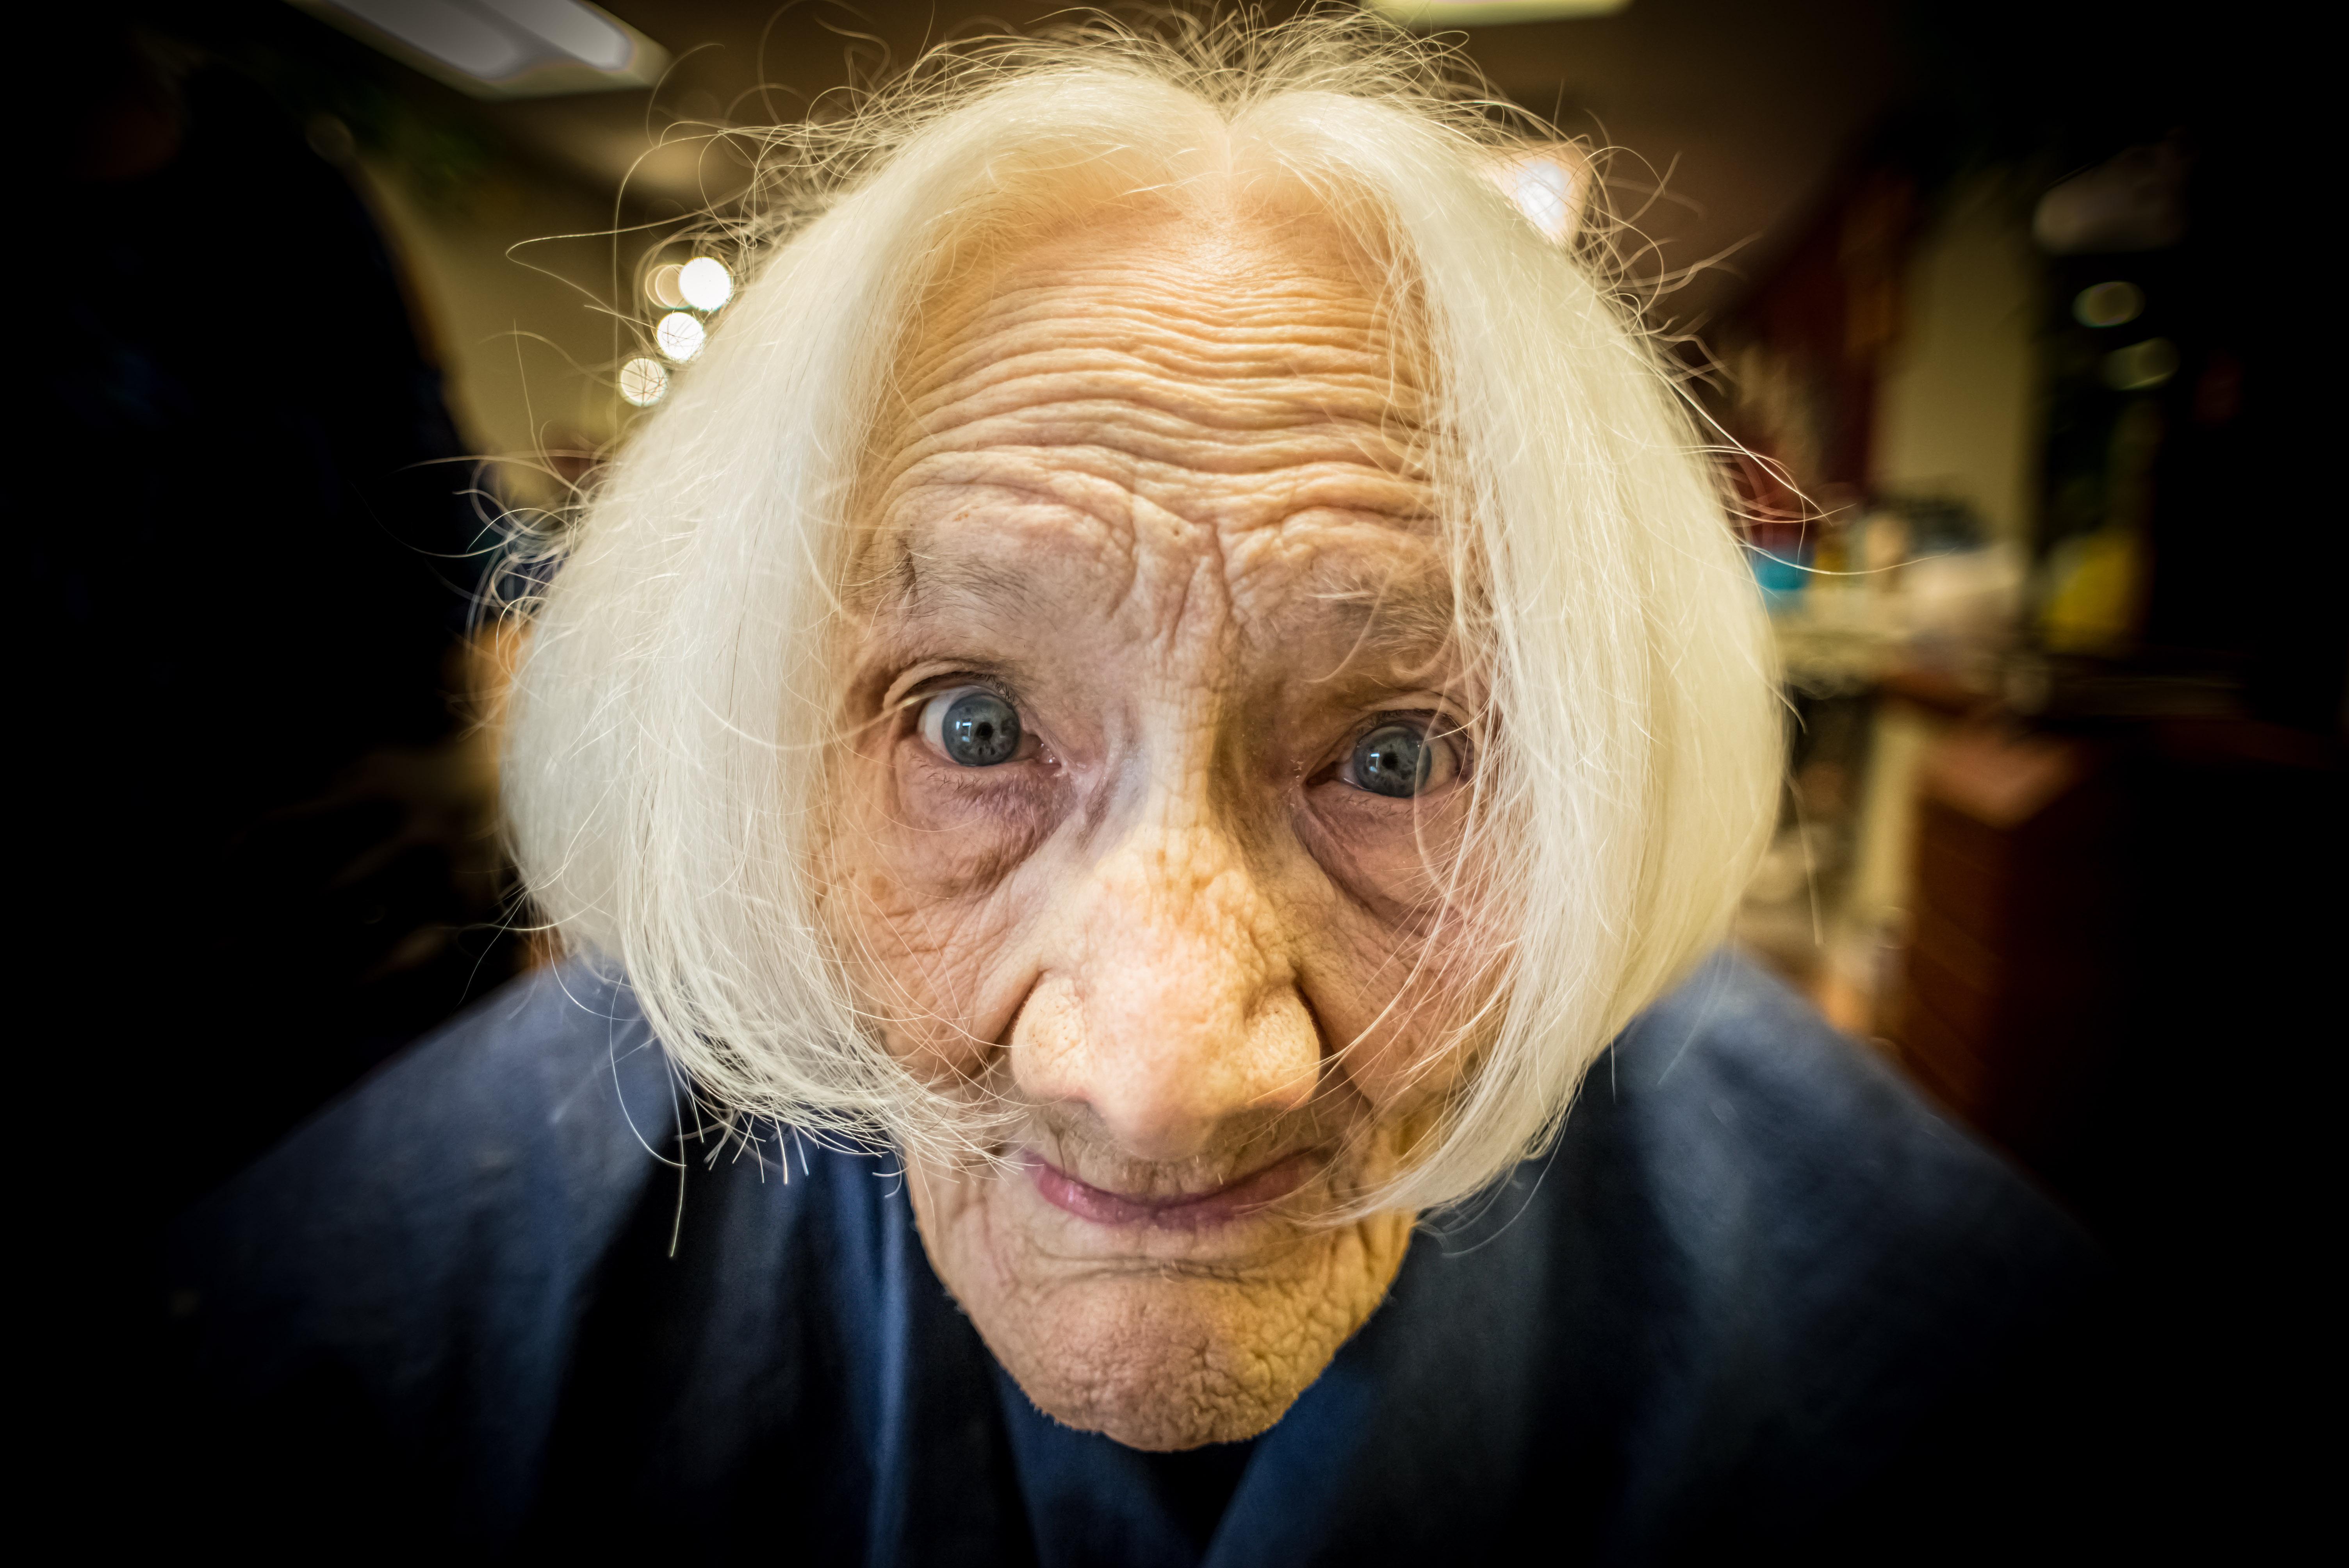 Grandmas Got A Sassy New Hairdo One L Short Of Normal